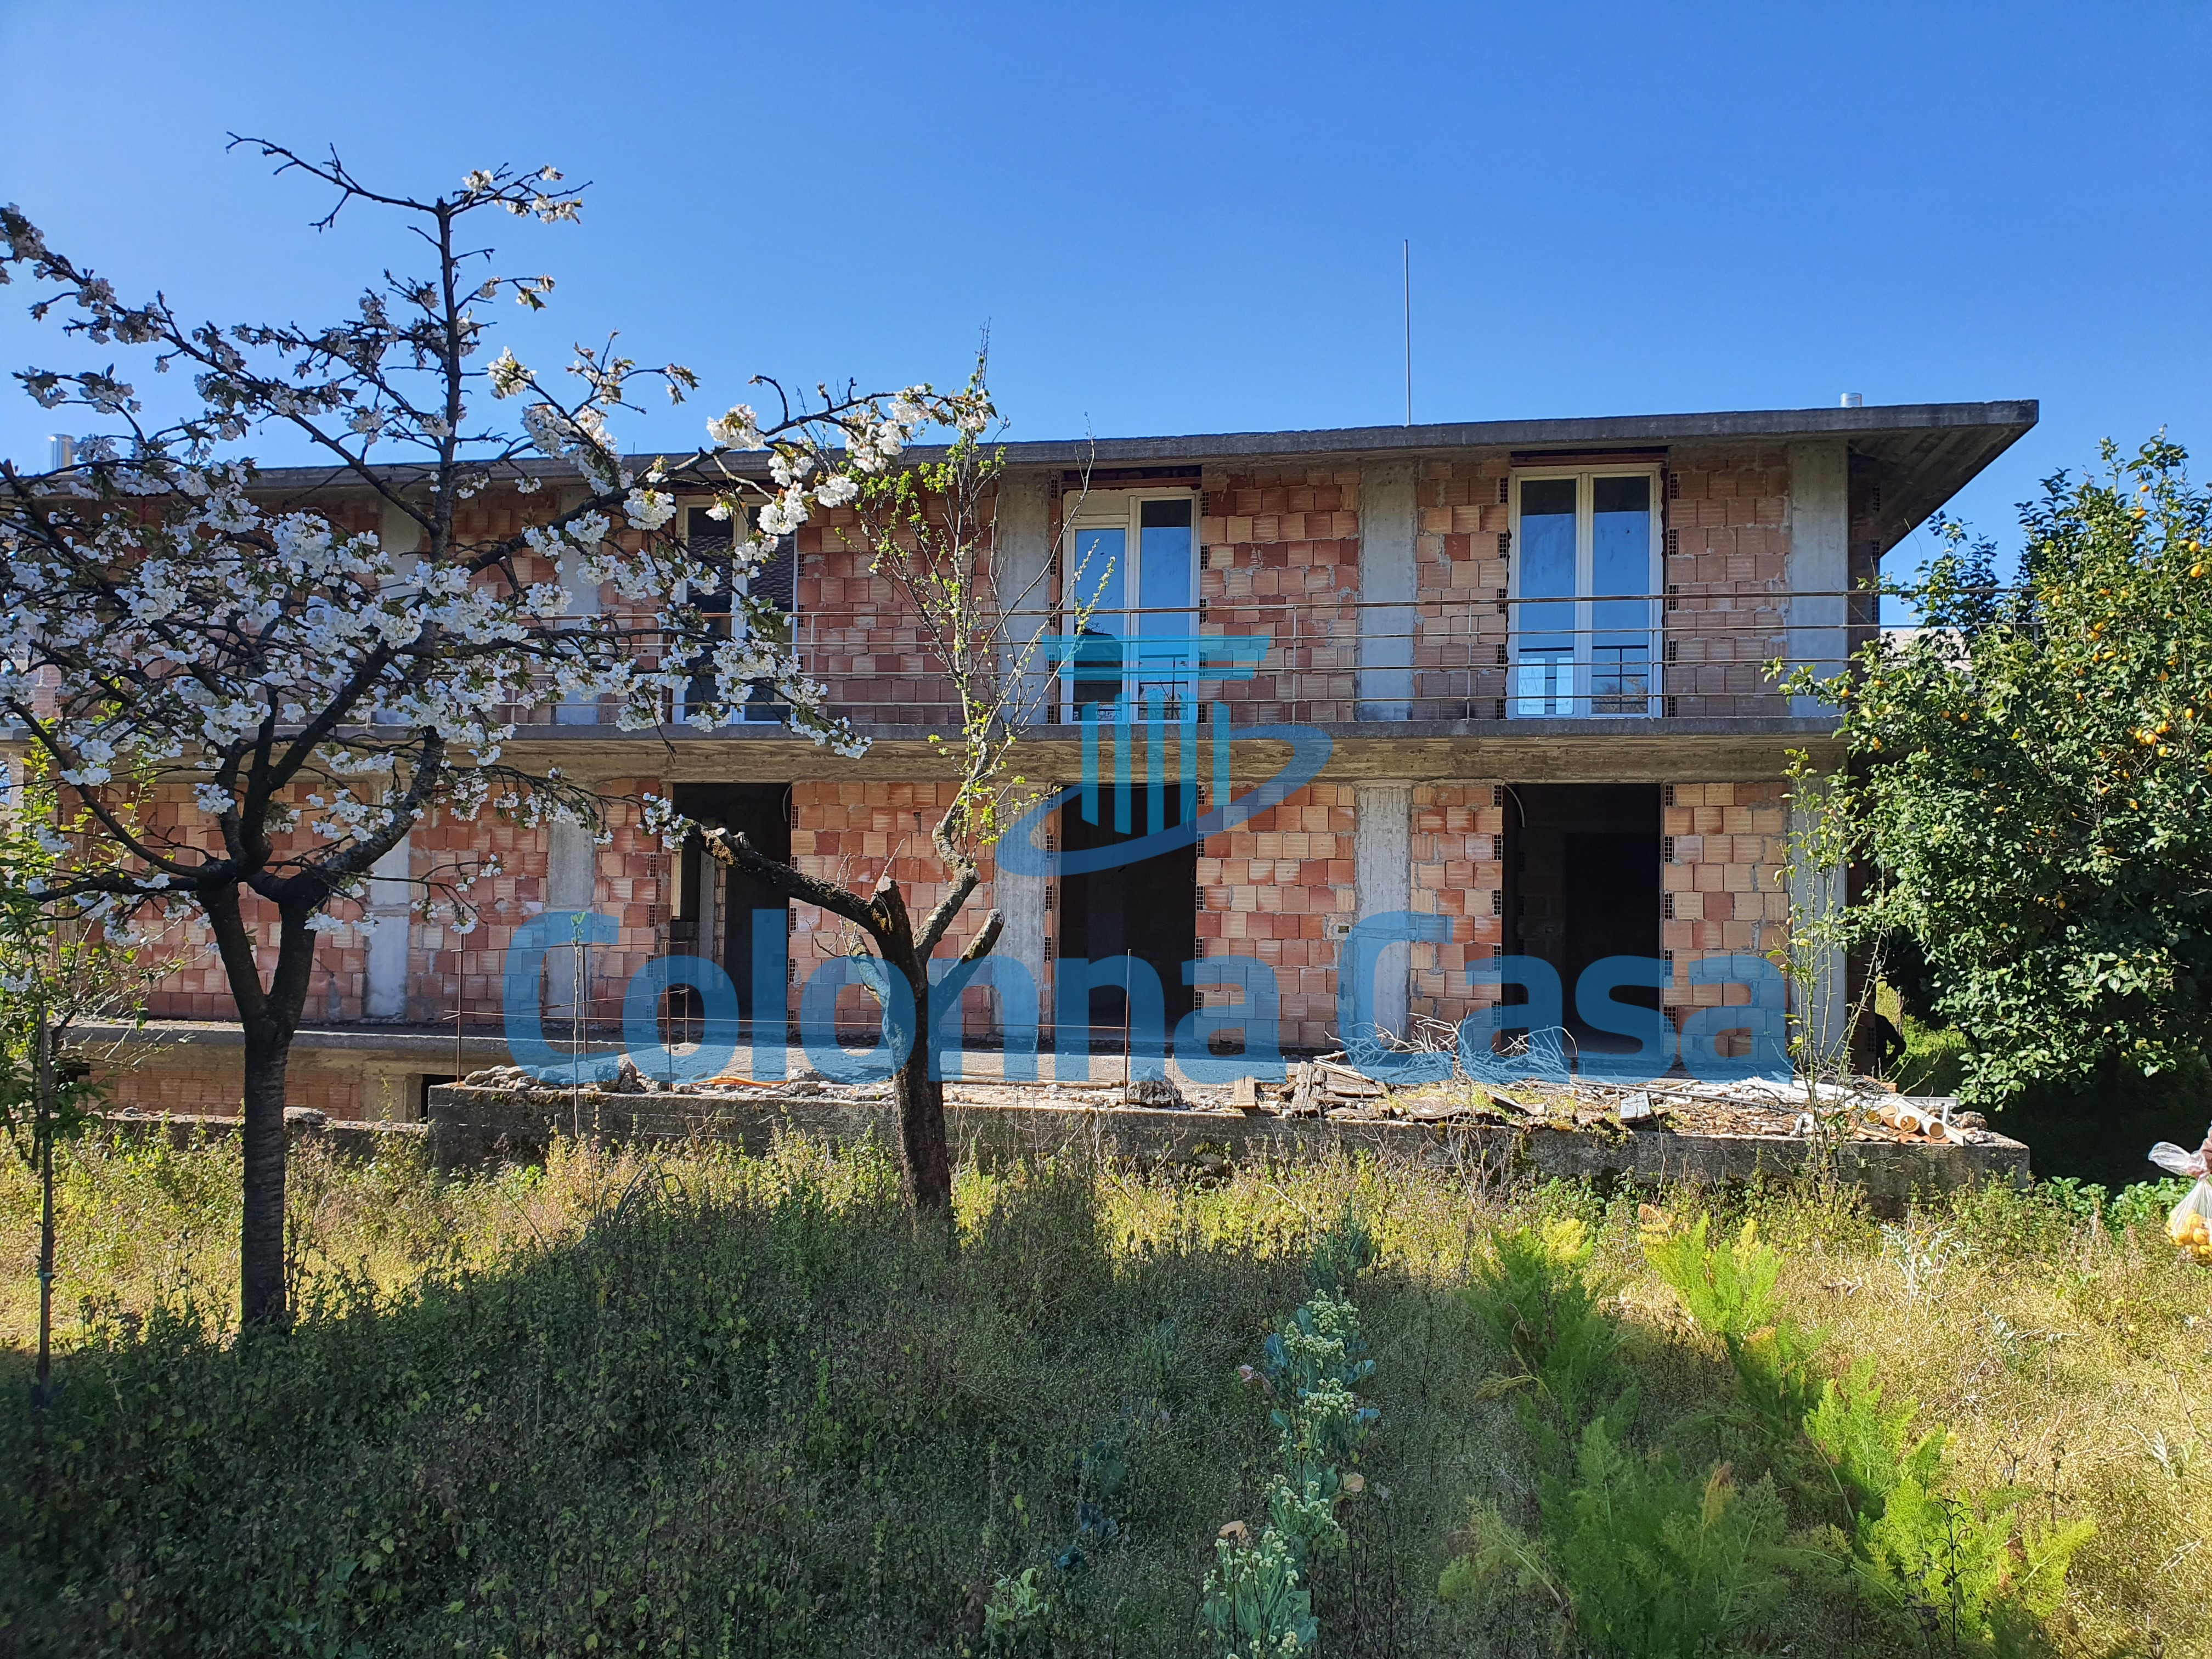 Montoro (AV) Villa indipendente allo stato grezzo con giardino